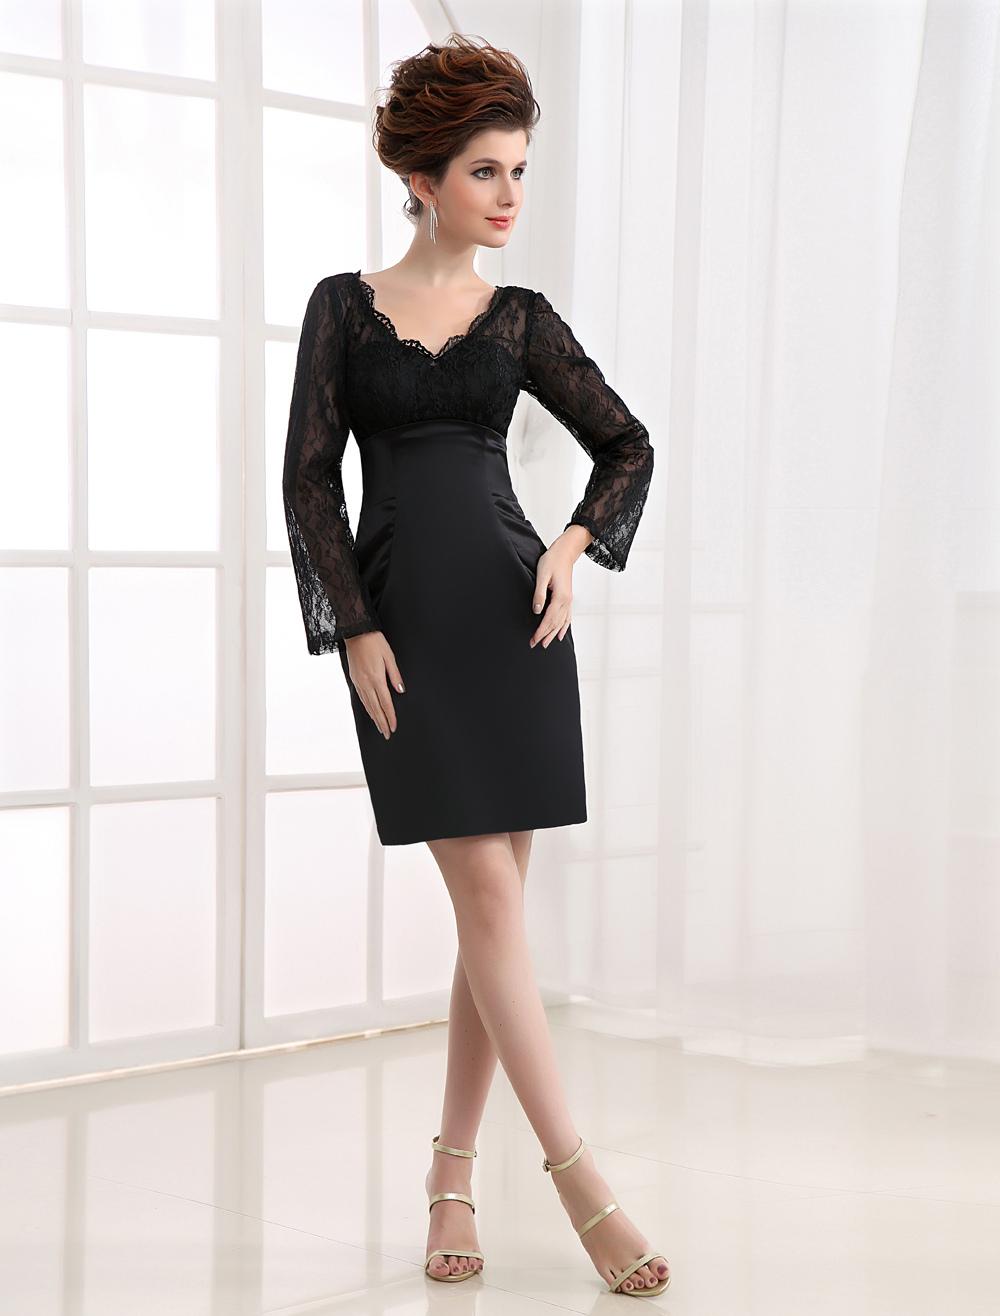 Black Long Sleeves Lace V-Neck Sheath Satin Cocktail Dress - Milanoo.com